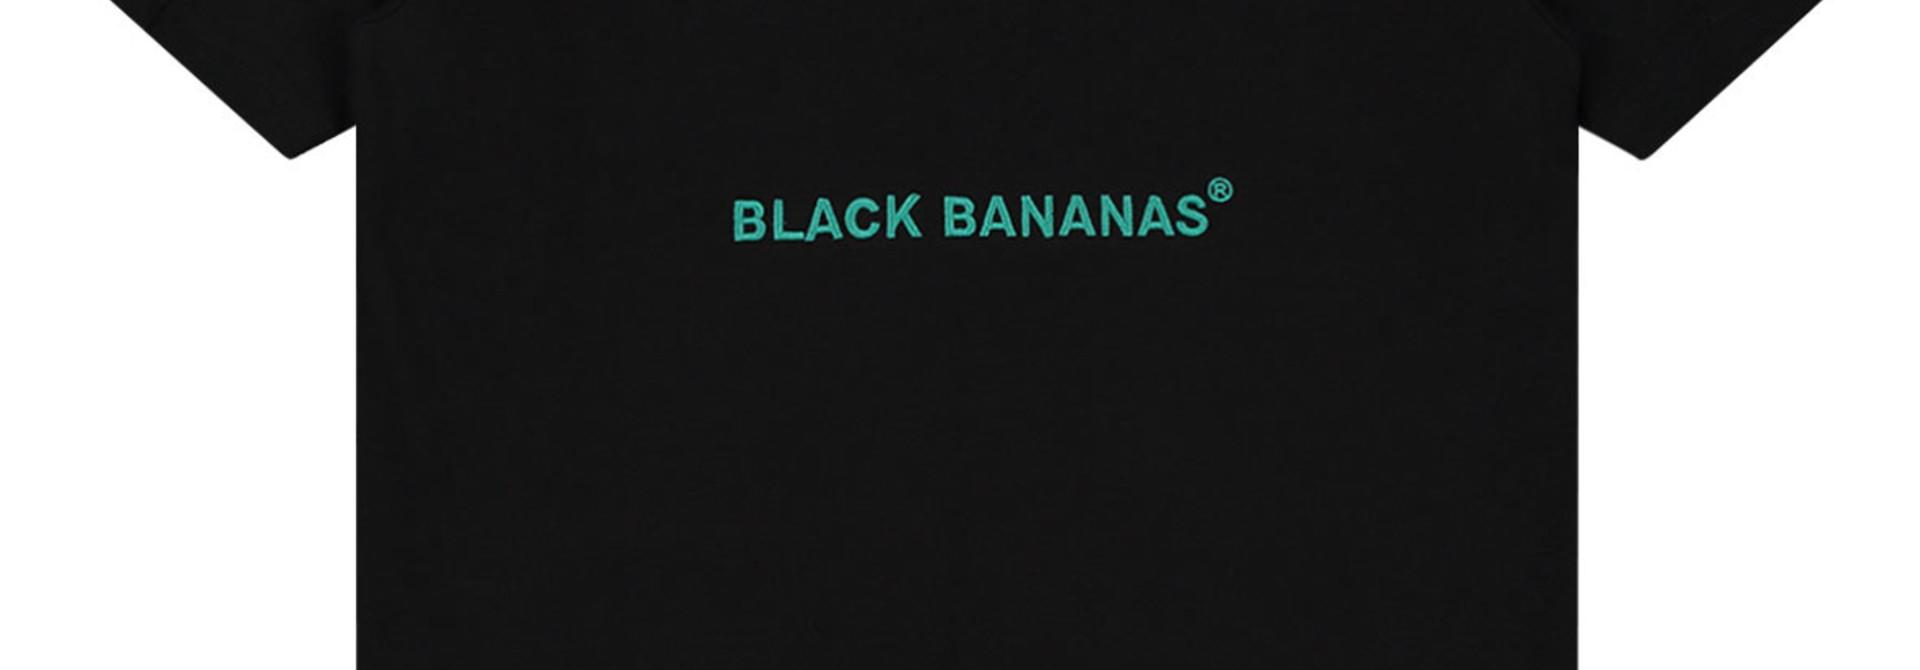 Black Bananas Jr Unity Tee Black/Agua